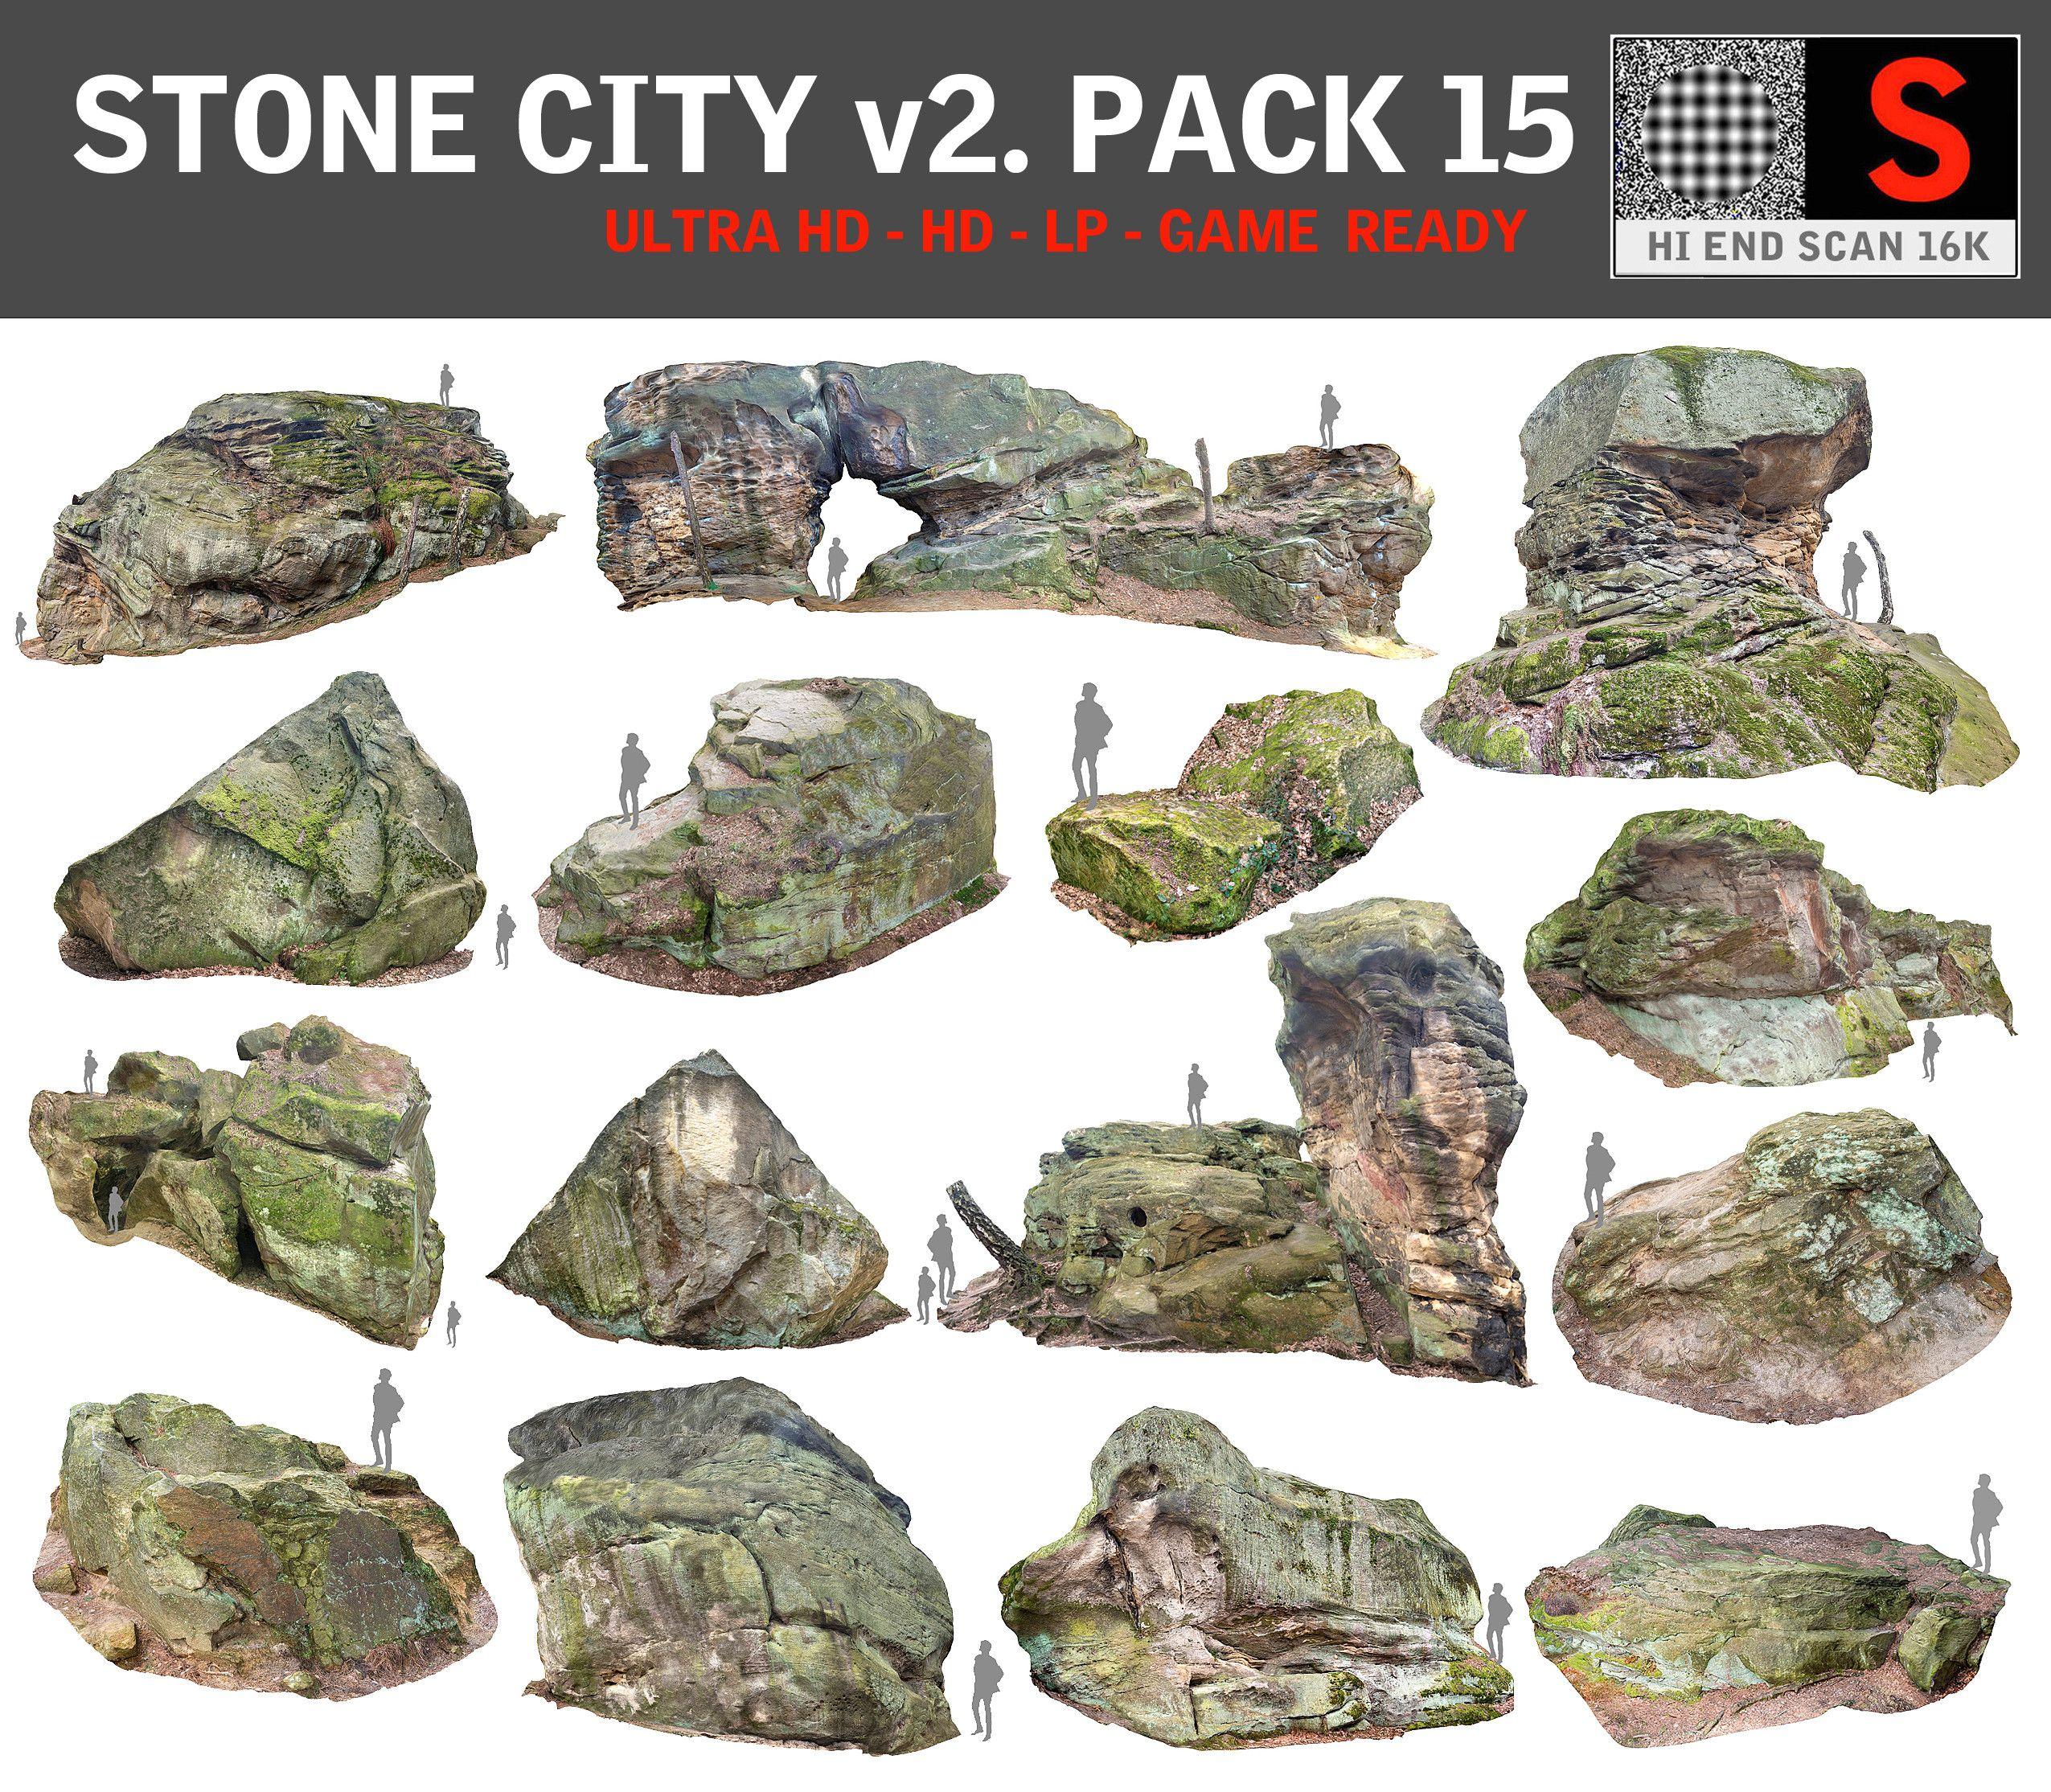 3d model stone forest 15 pack Дикие, Растения, Камень